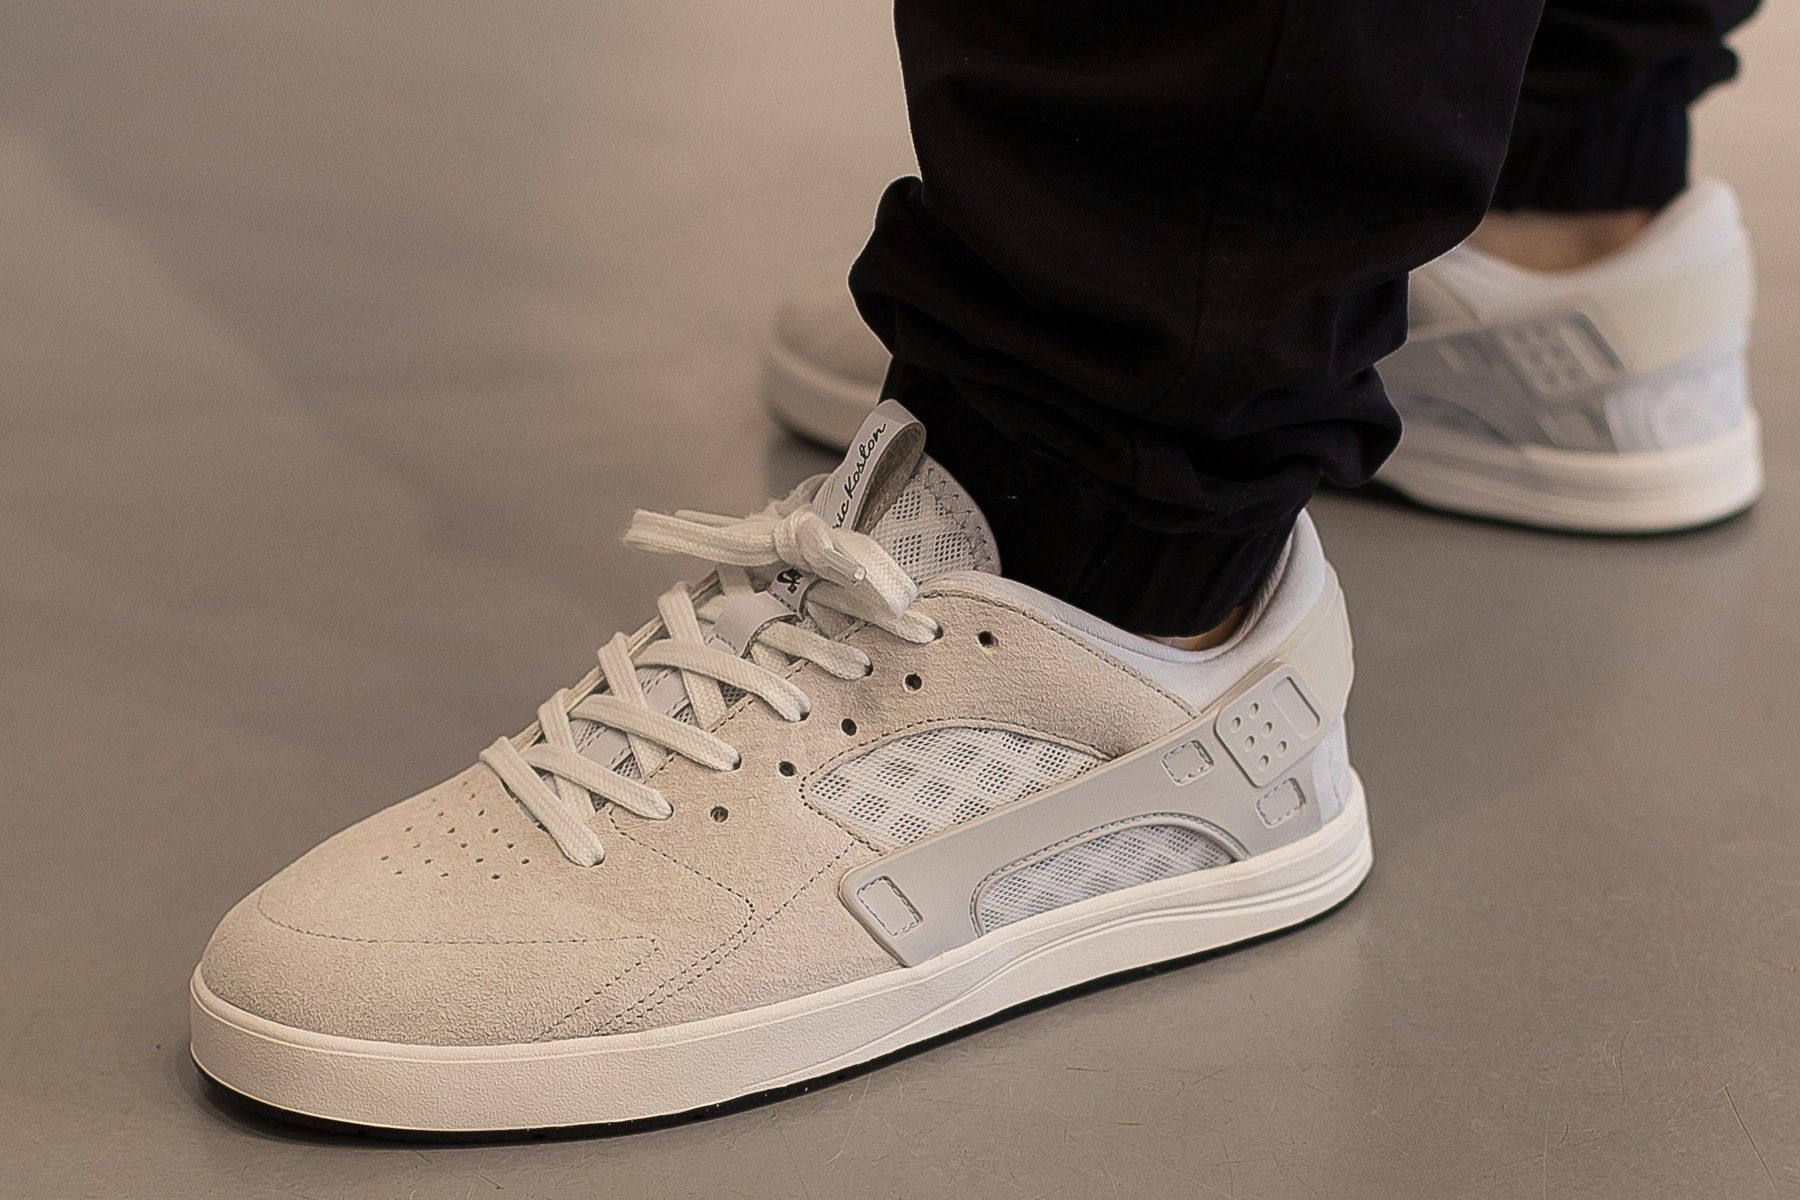 Scoprire più nuovo di vendita caldo ultima collezione Nike SB Eric Koston Huarache (Weiß / Platinum / Schwarz) | Nike sb ...